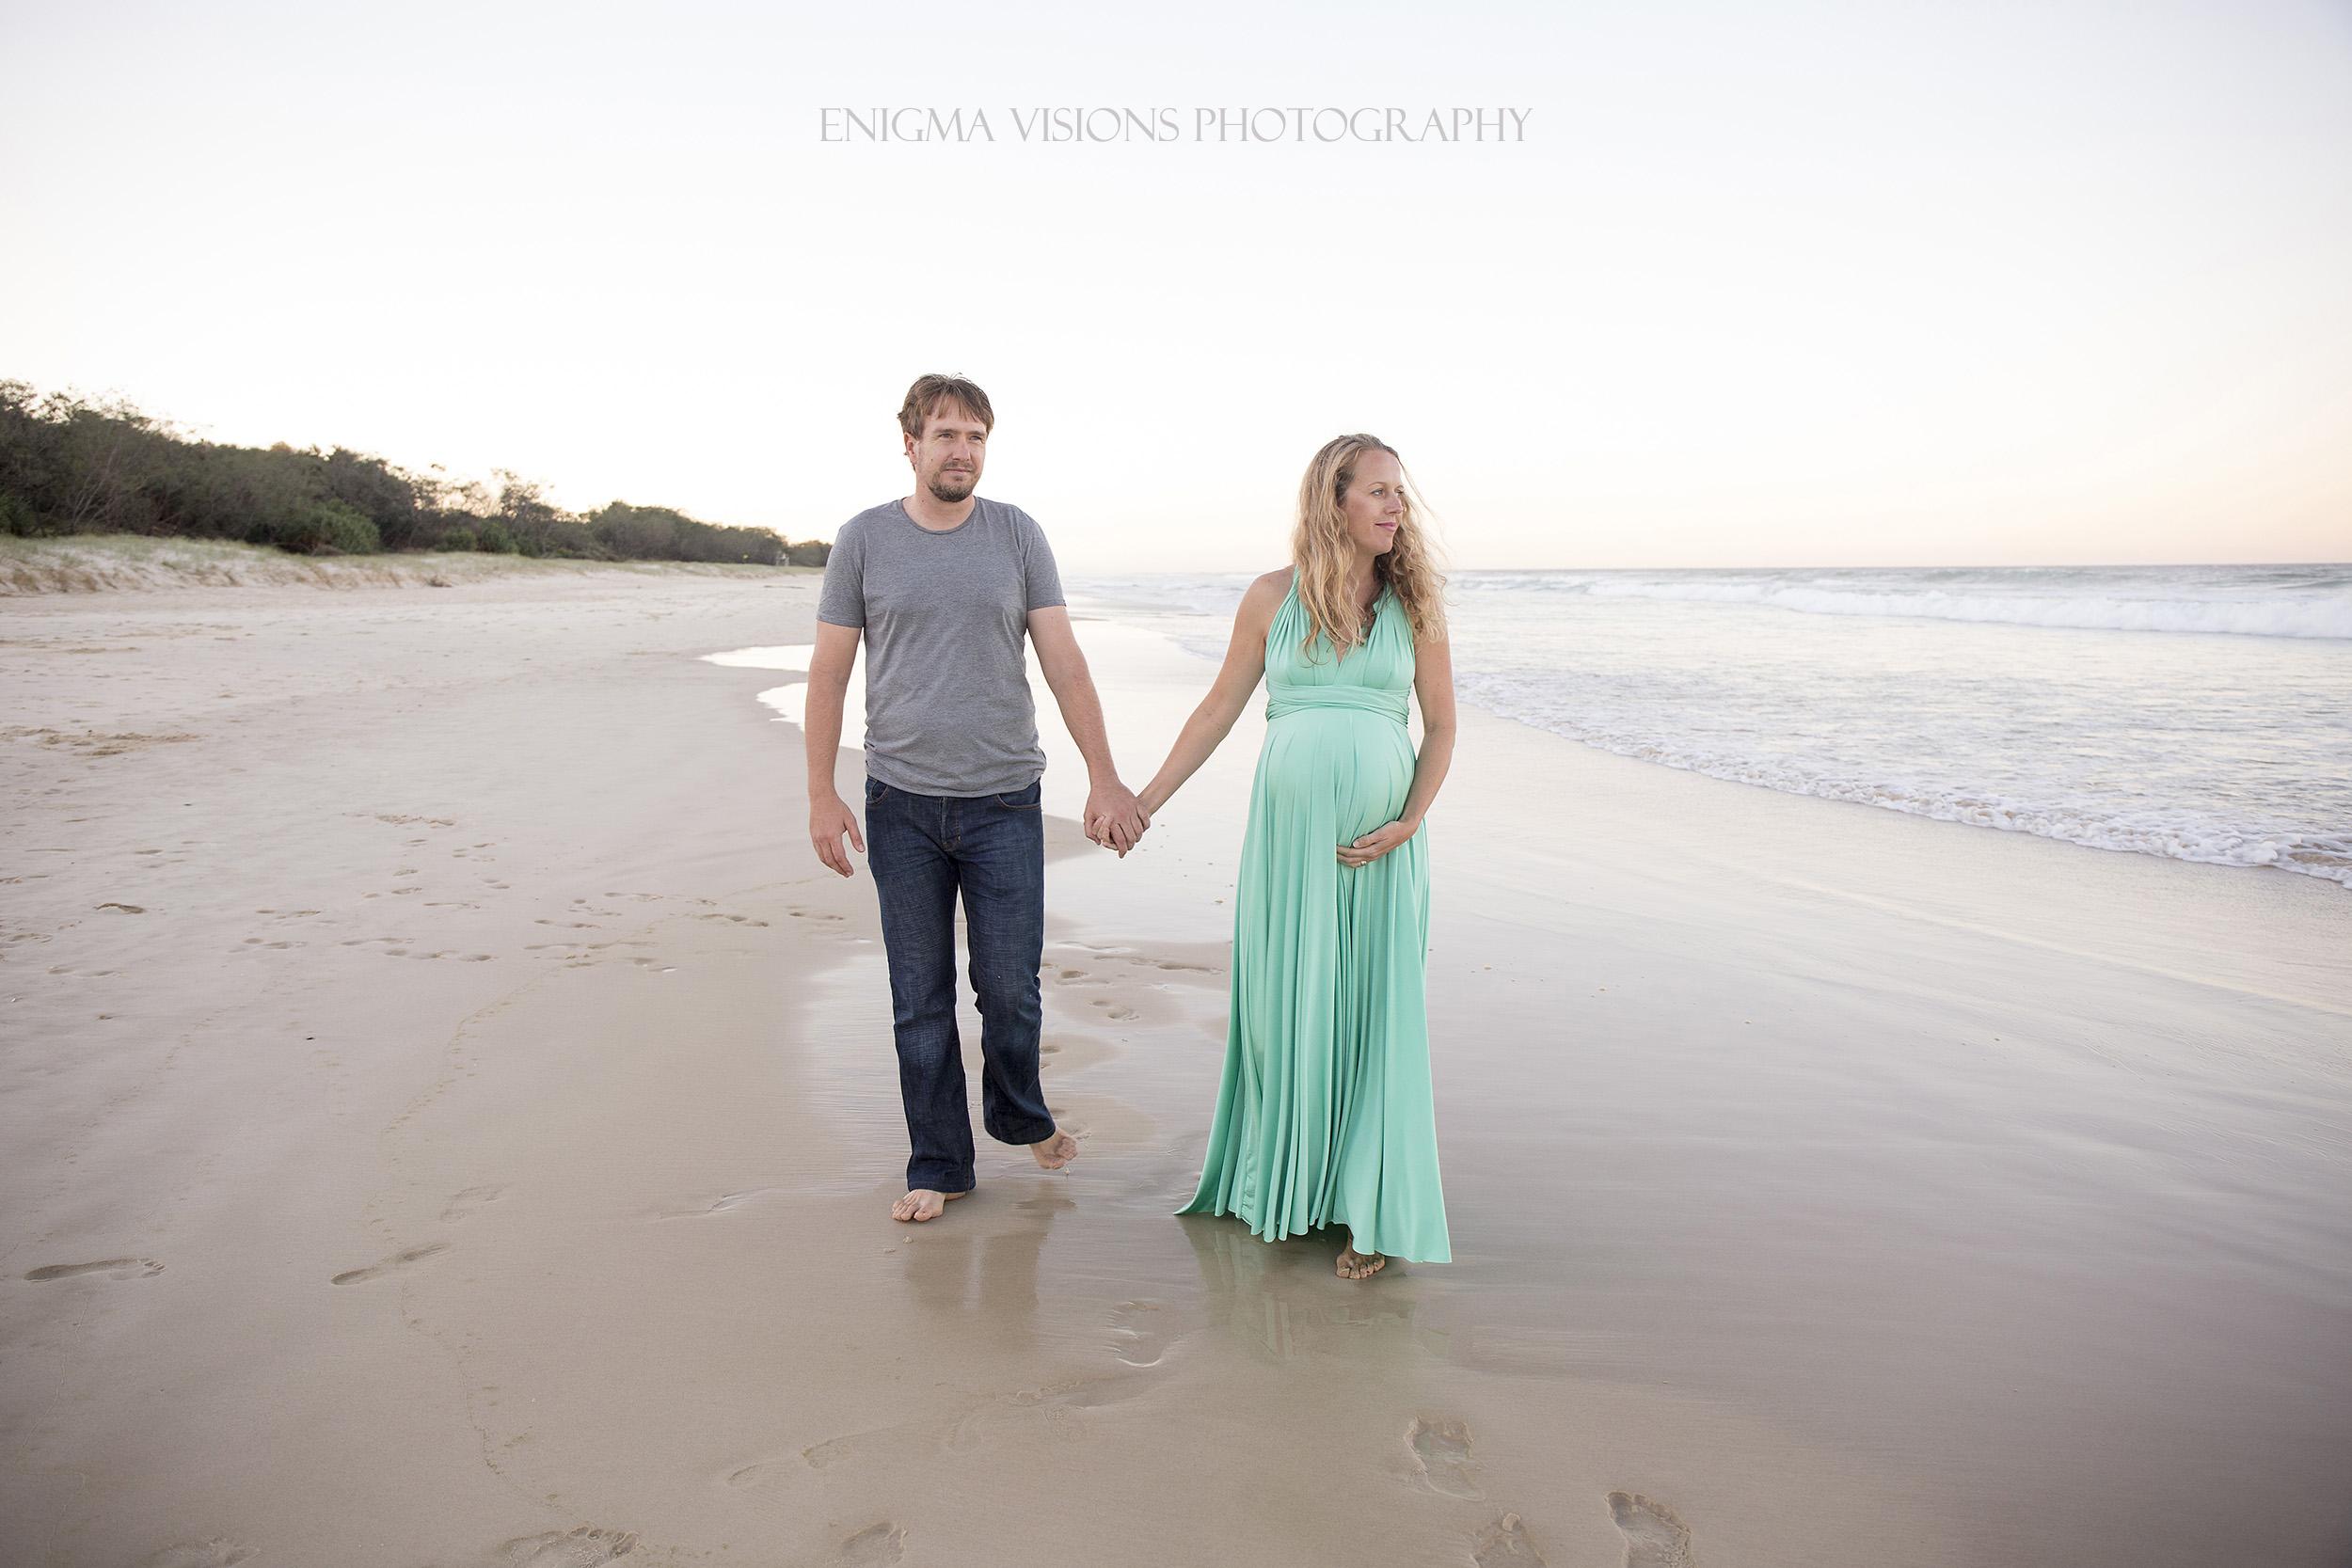 enigma_visions_photography_maternity_melandandrew_kingscliff (49).jpg